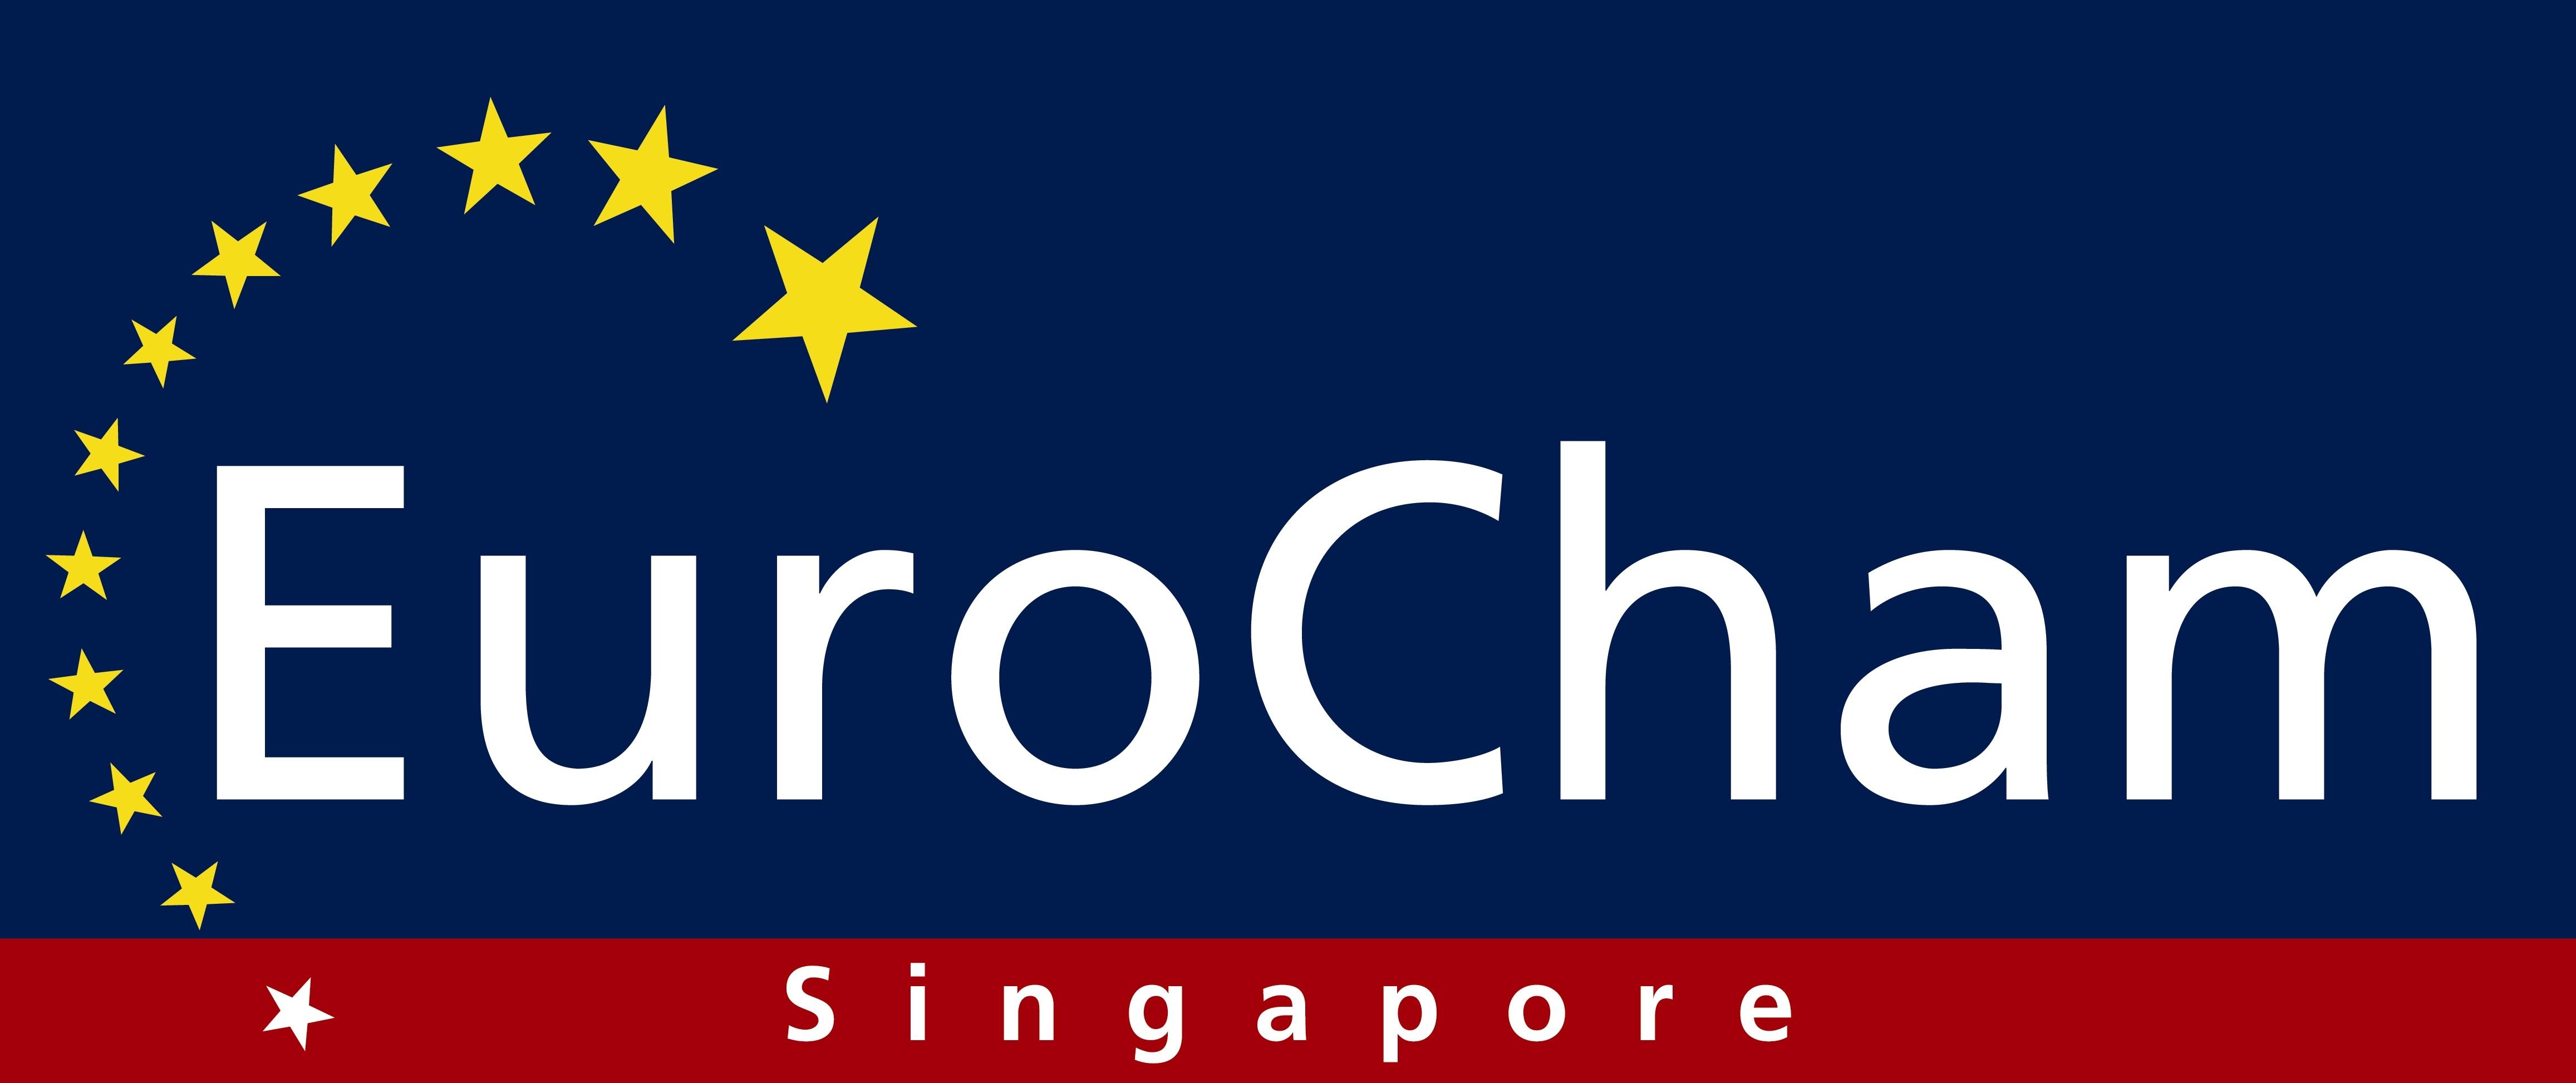 European_Chamber_of_Commerce_Singapore_high_res.jpg